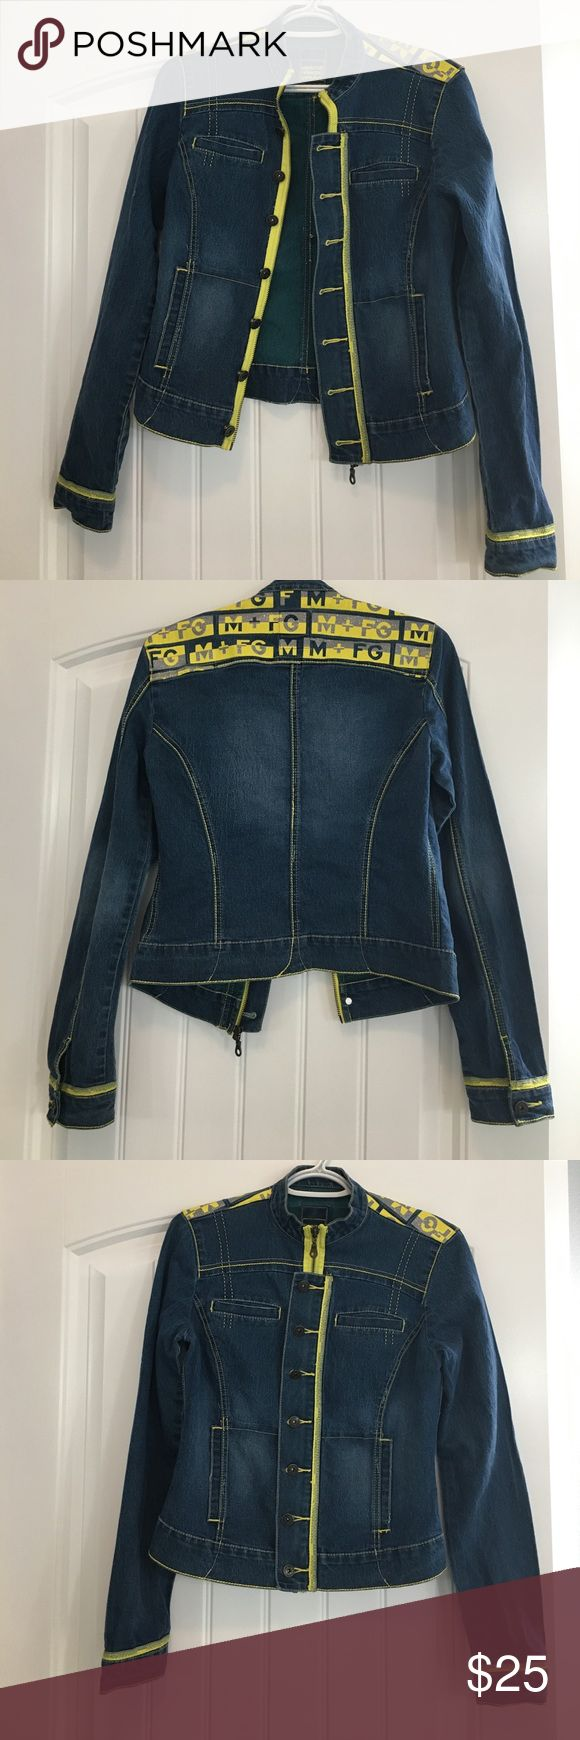 marithe francois girbaud jean jacket EUC. Marithe Francois Girbaud jean jacket marithe francois girbaud  Jackets & Coats Jean Jackets